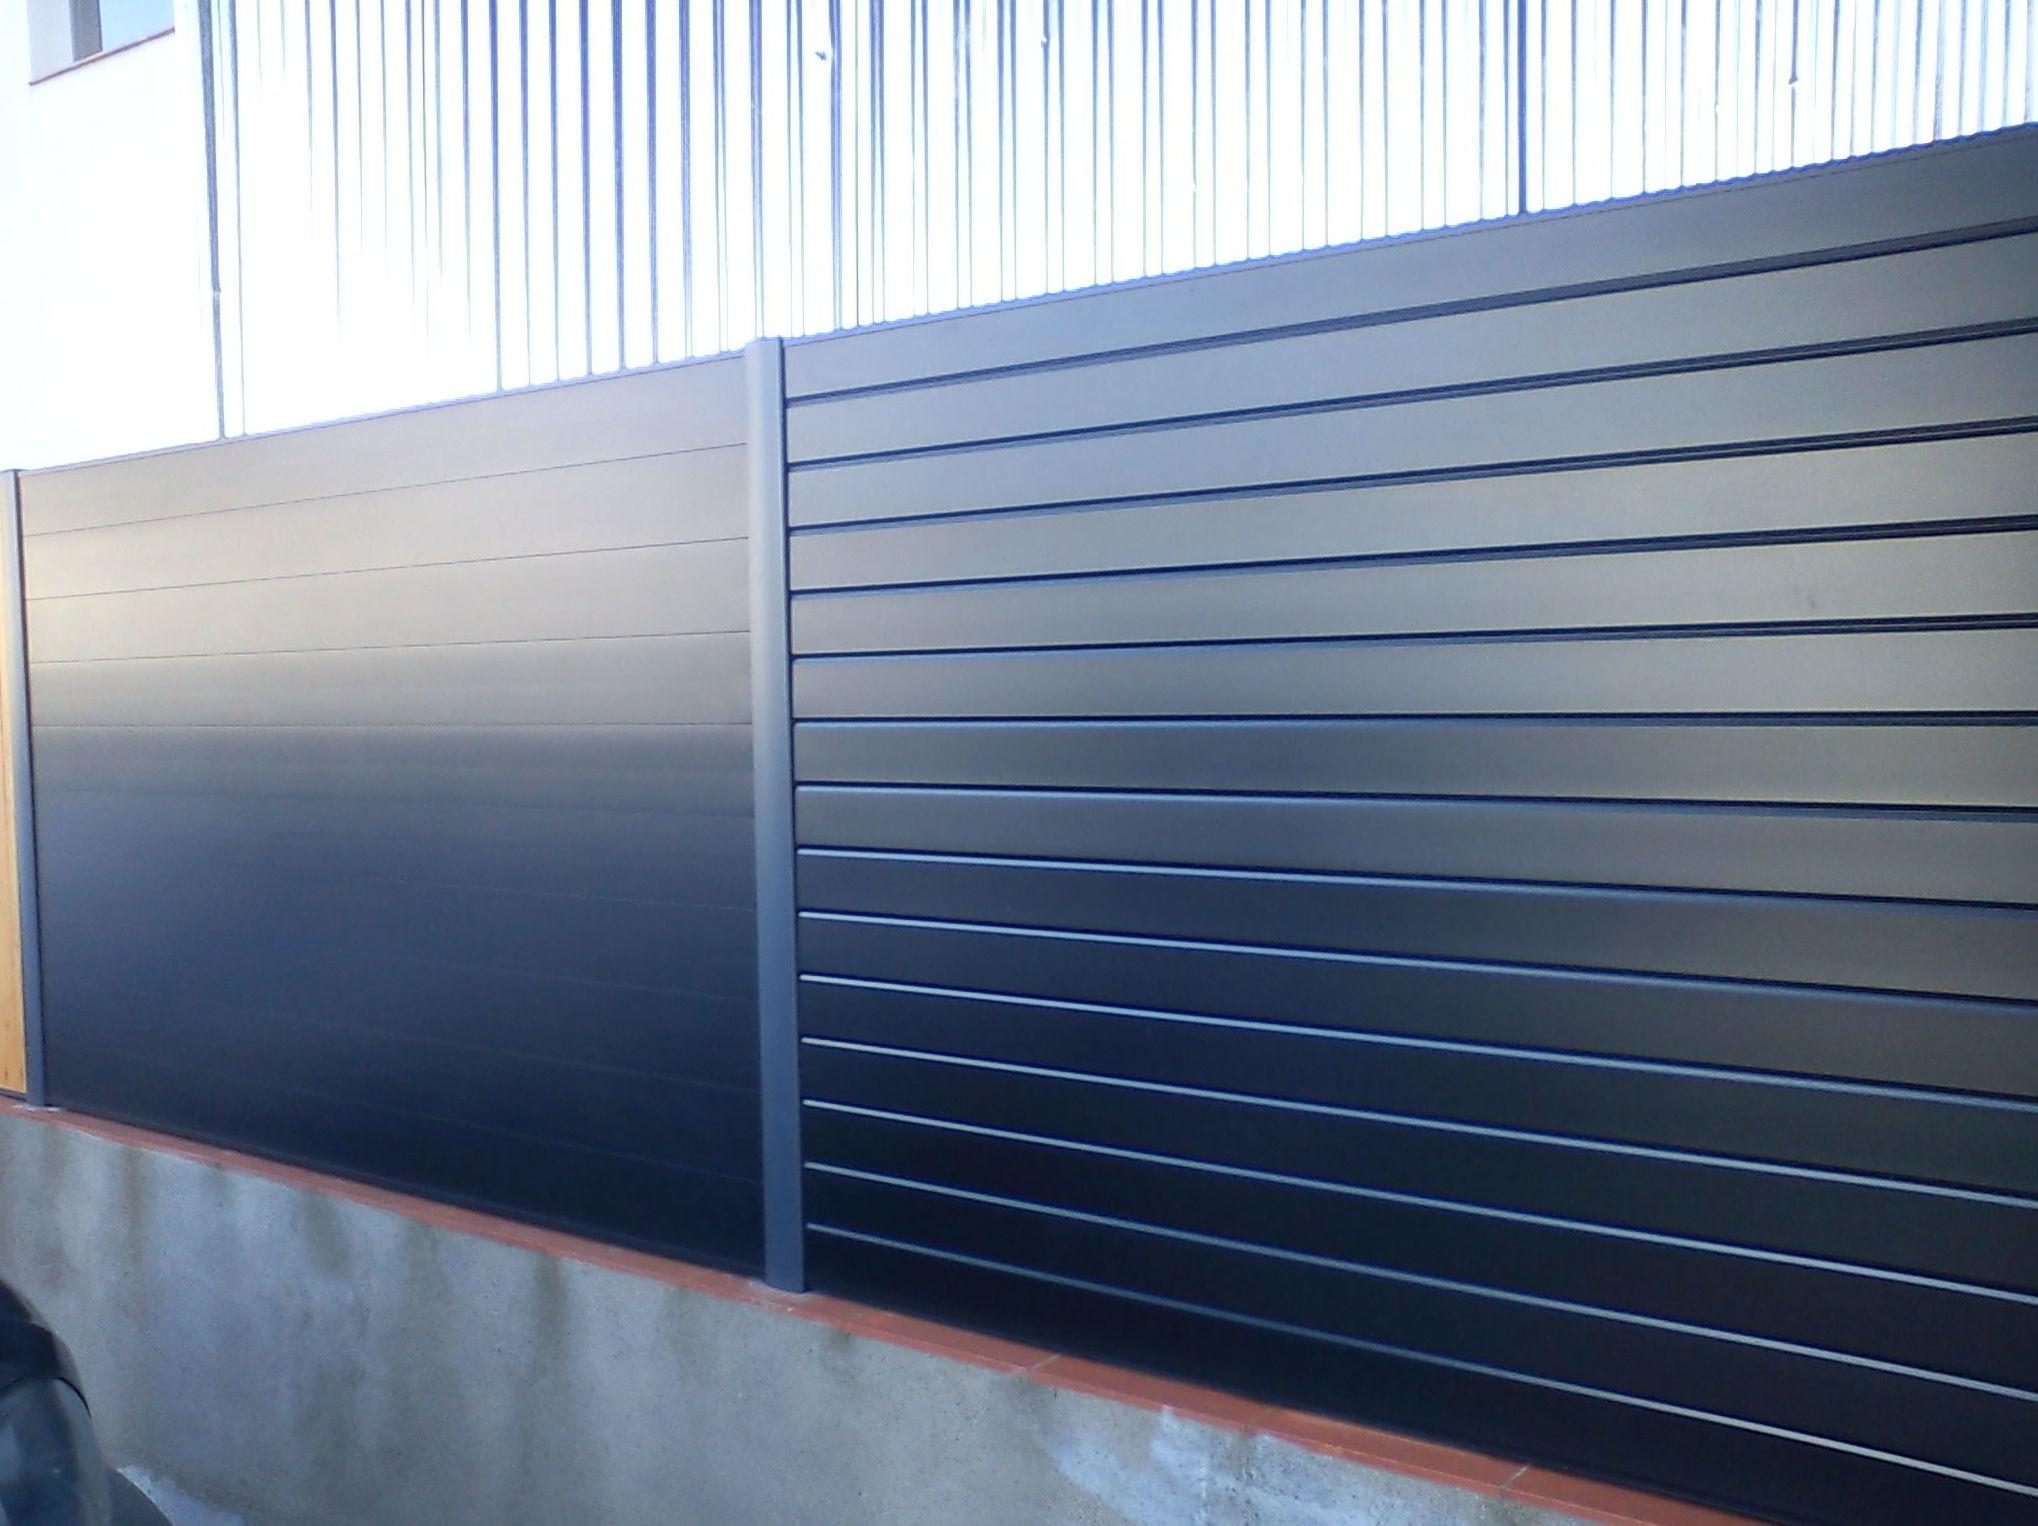 Puertas Jardin Aluminio Affordable Puerta De Jardn With Puertas  ~ Puertas Jardin Aluminio Precios